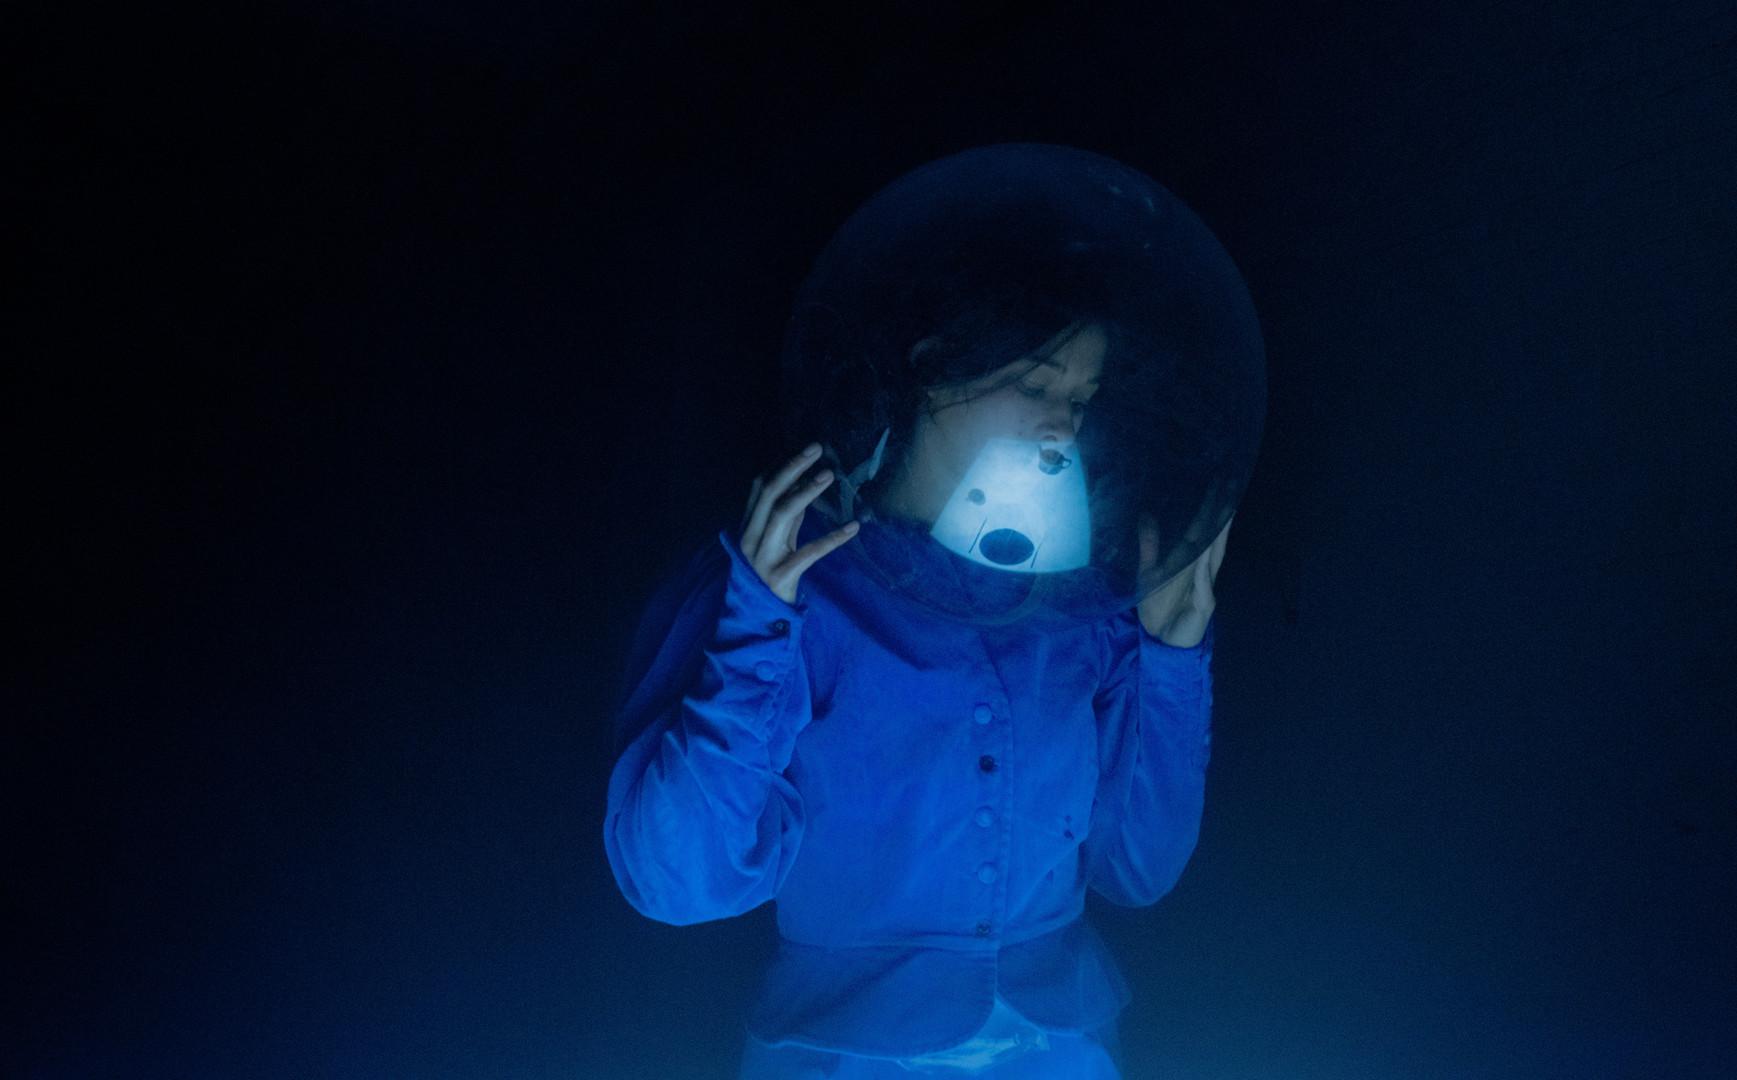 DREAMSOFSLEEP_Astronaut_8.jpg